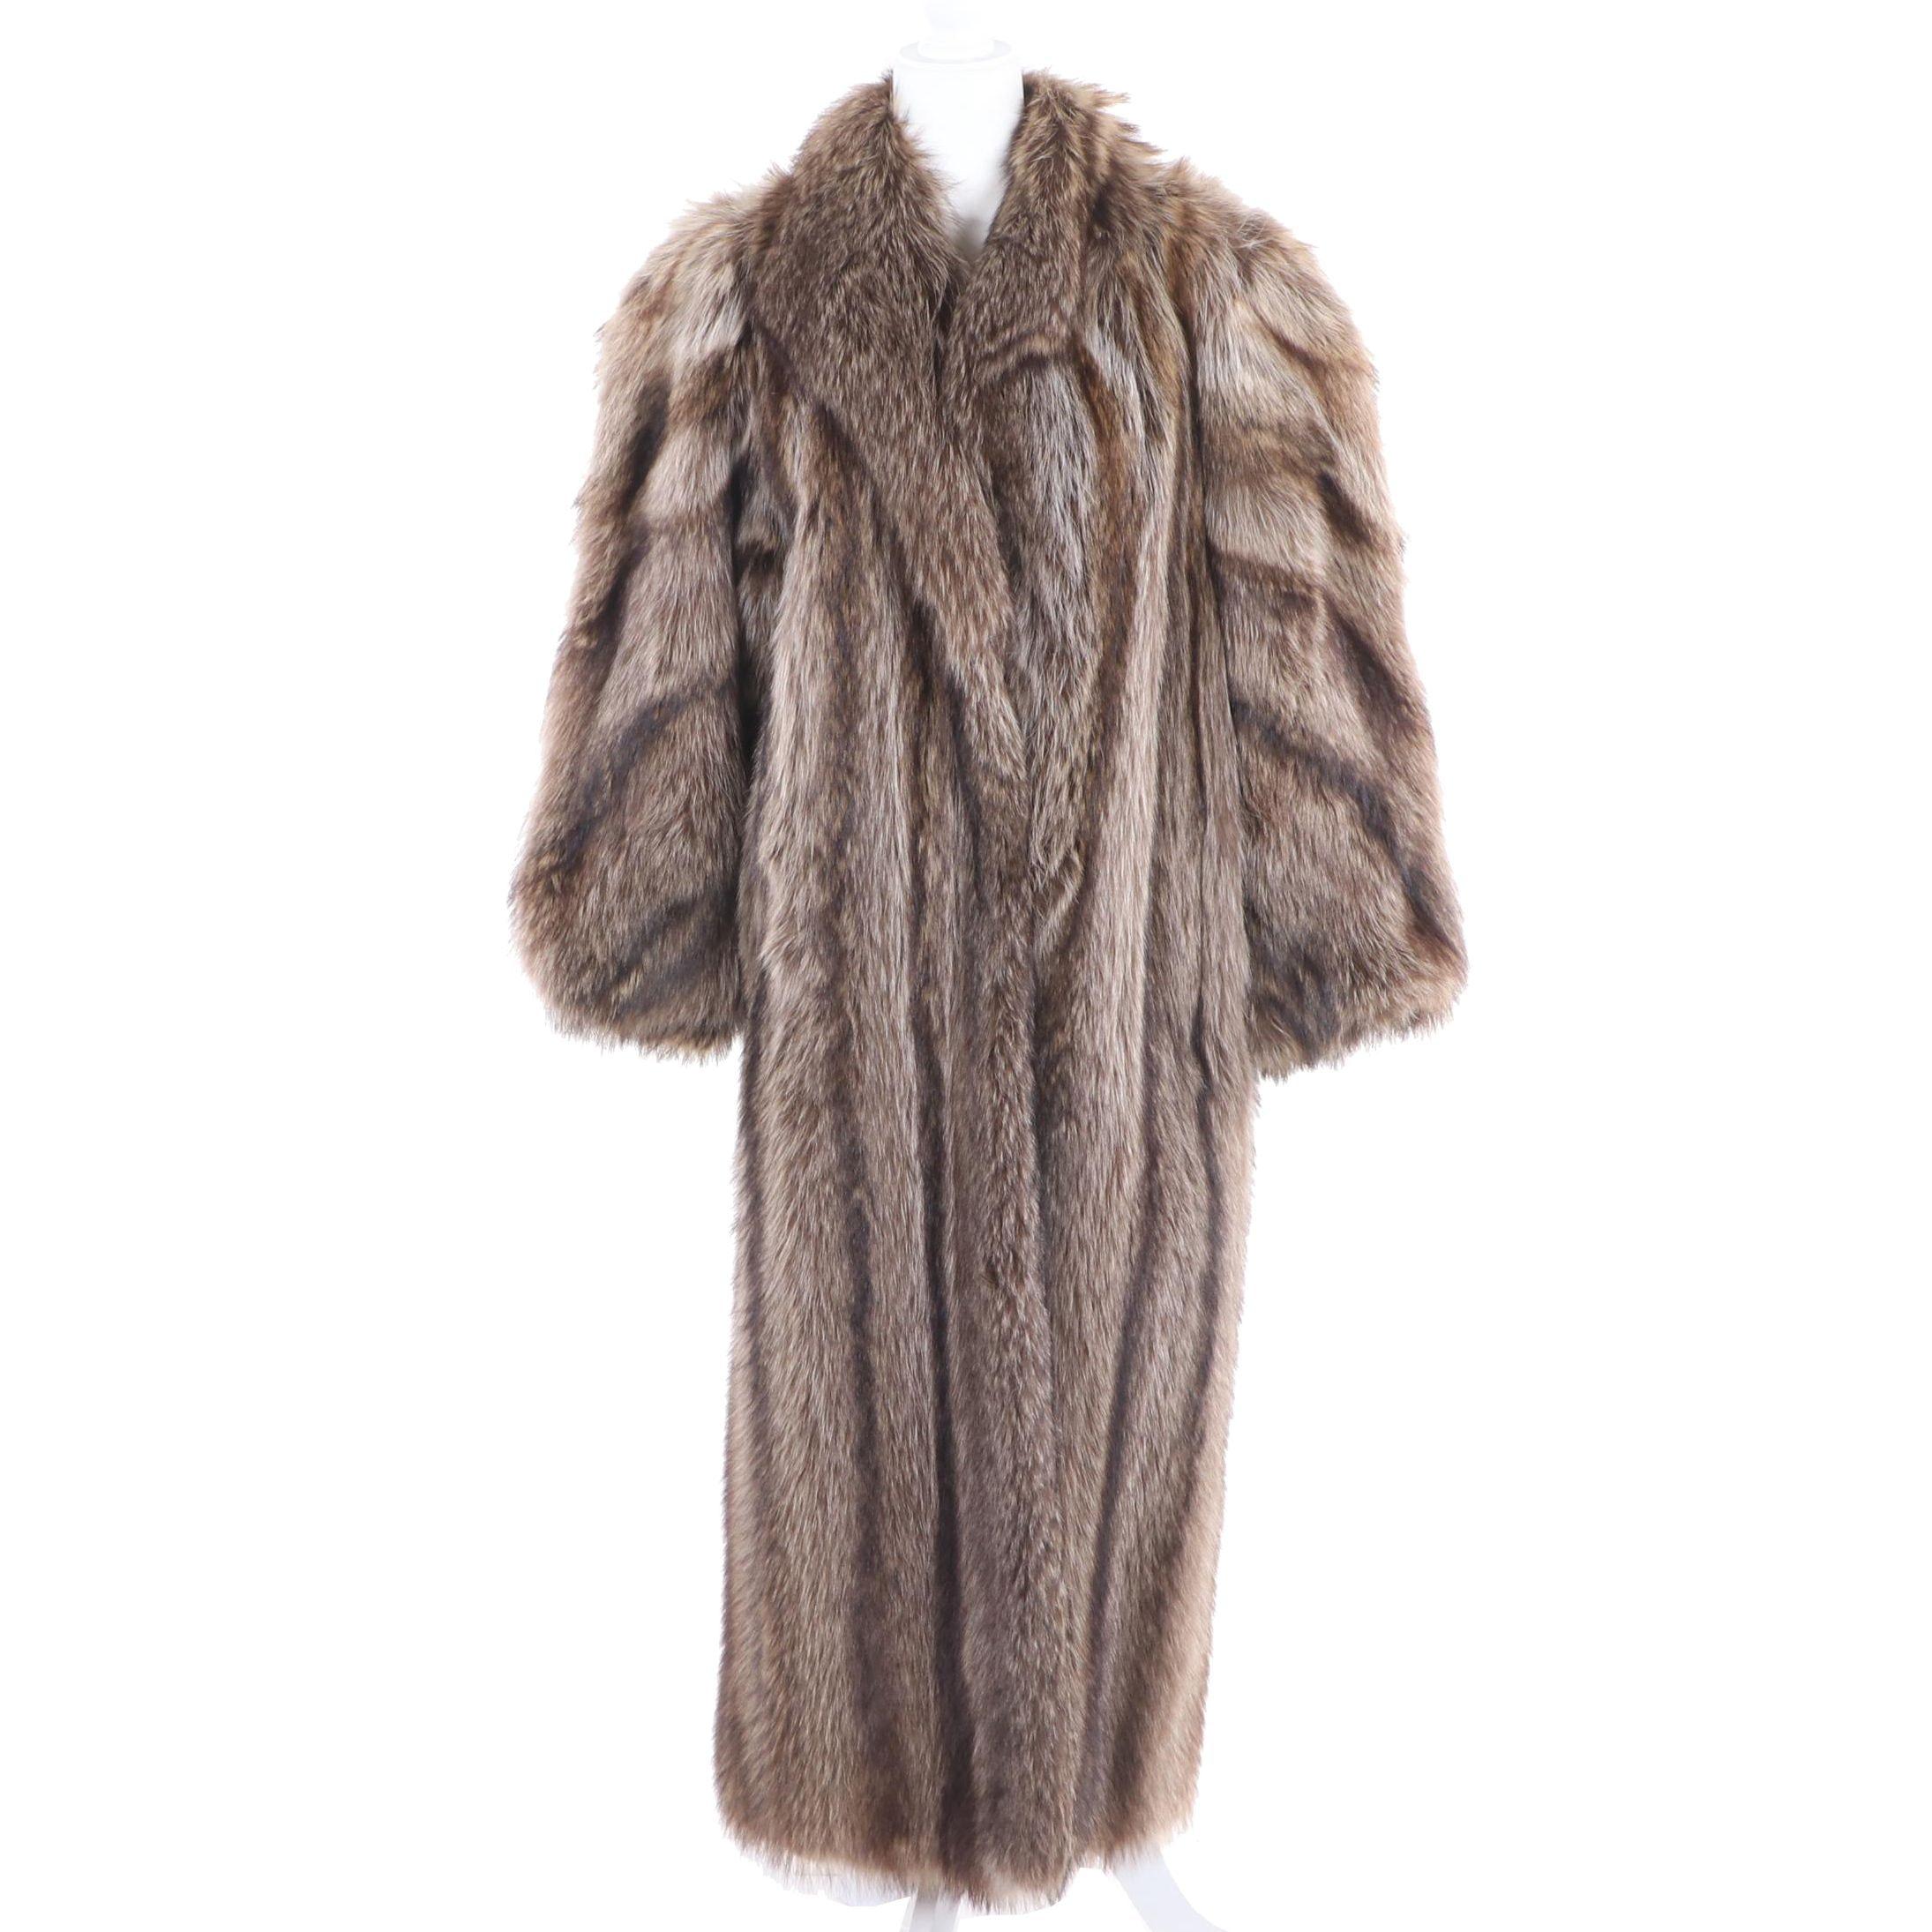 Women's Raccoon Fur Coat from Michael's Furs